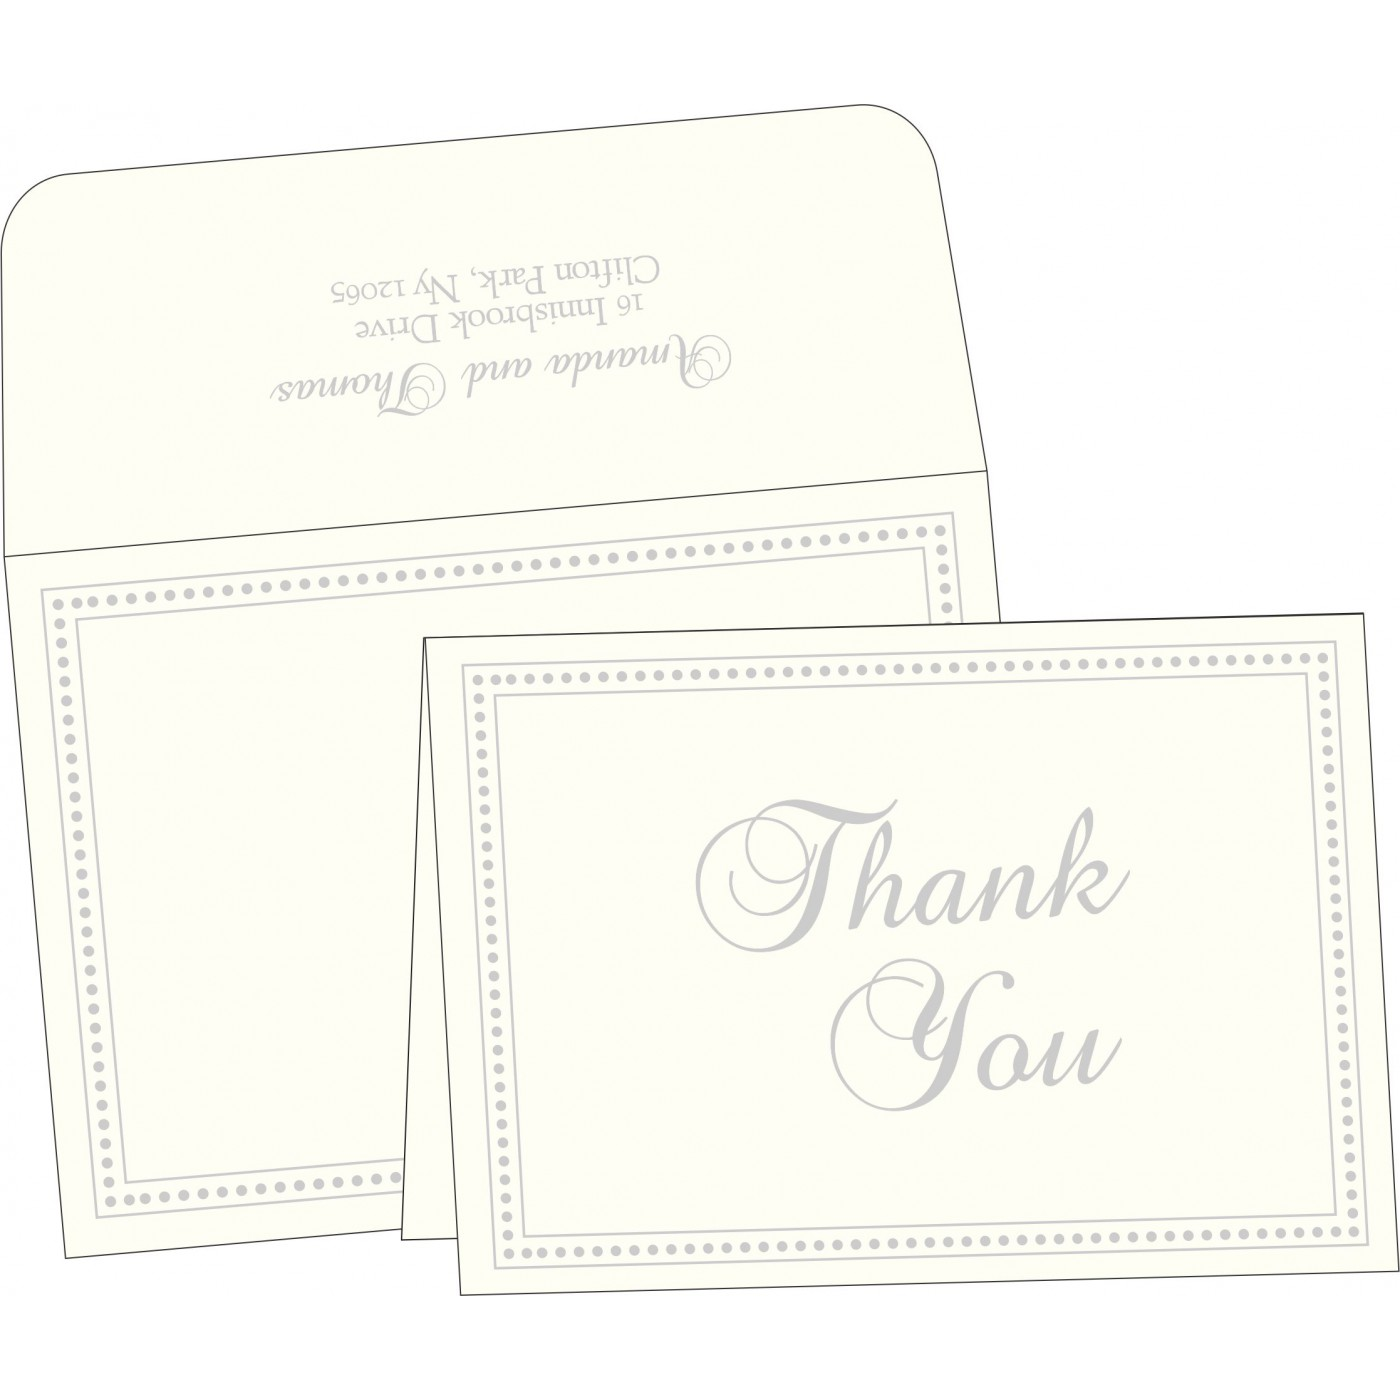 Thank You Cards : TYC-2015 - 123WeddingCards